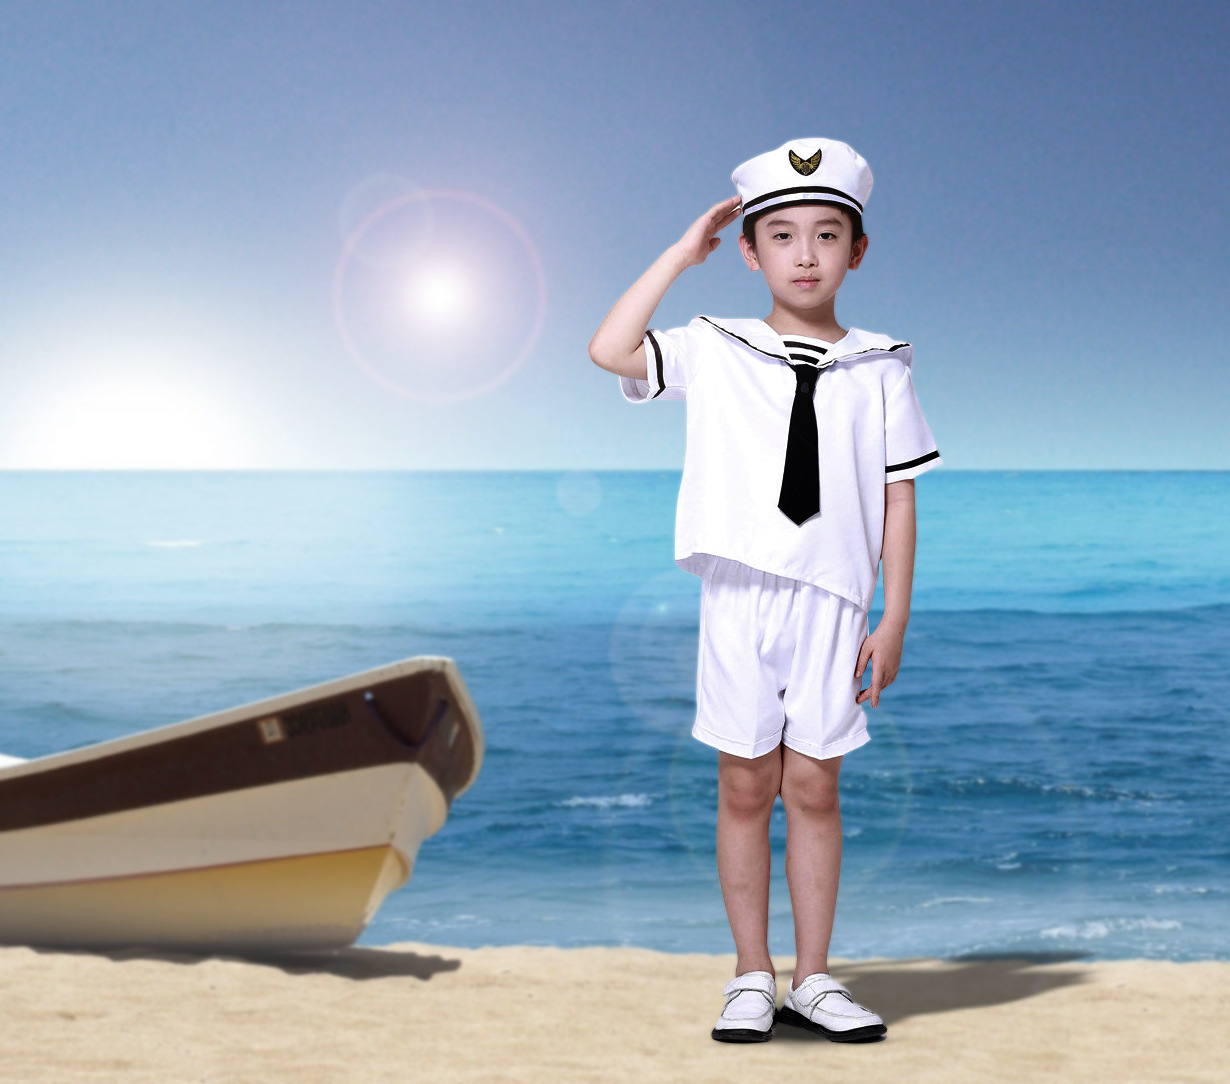 цена Spring Kids Clothes Marine Navy Sailor Boys Sport set Girl skirt Navy Short Sleeve Pullover Striped Sports Suit Hot Sale онлайн в 2017 году